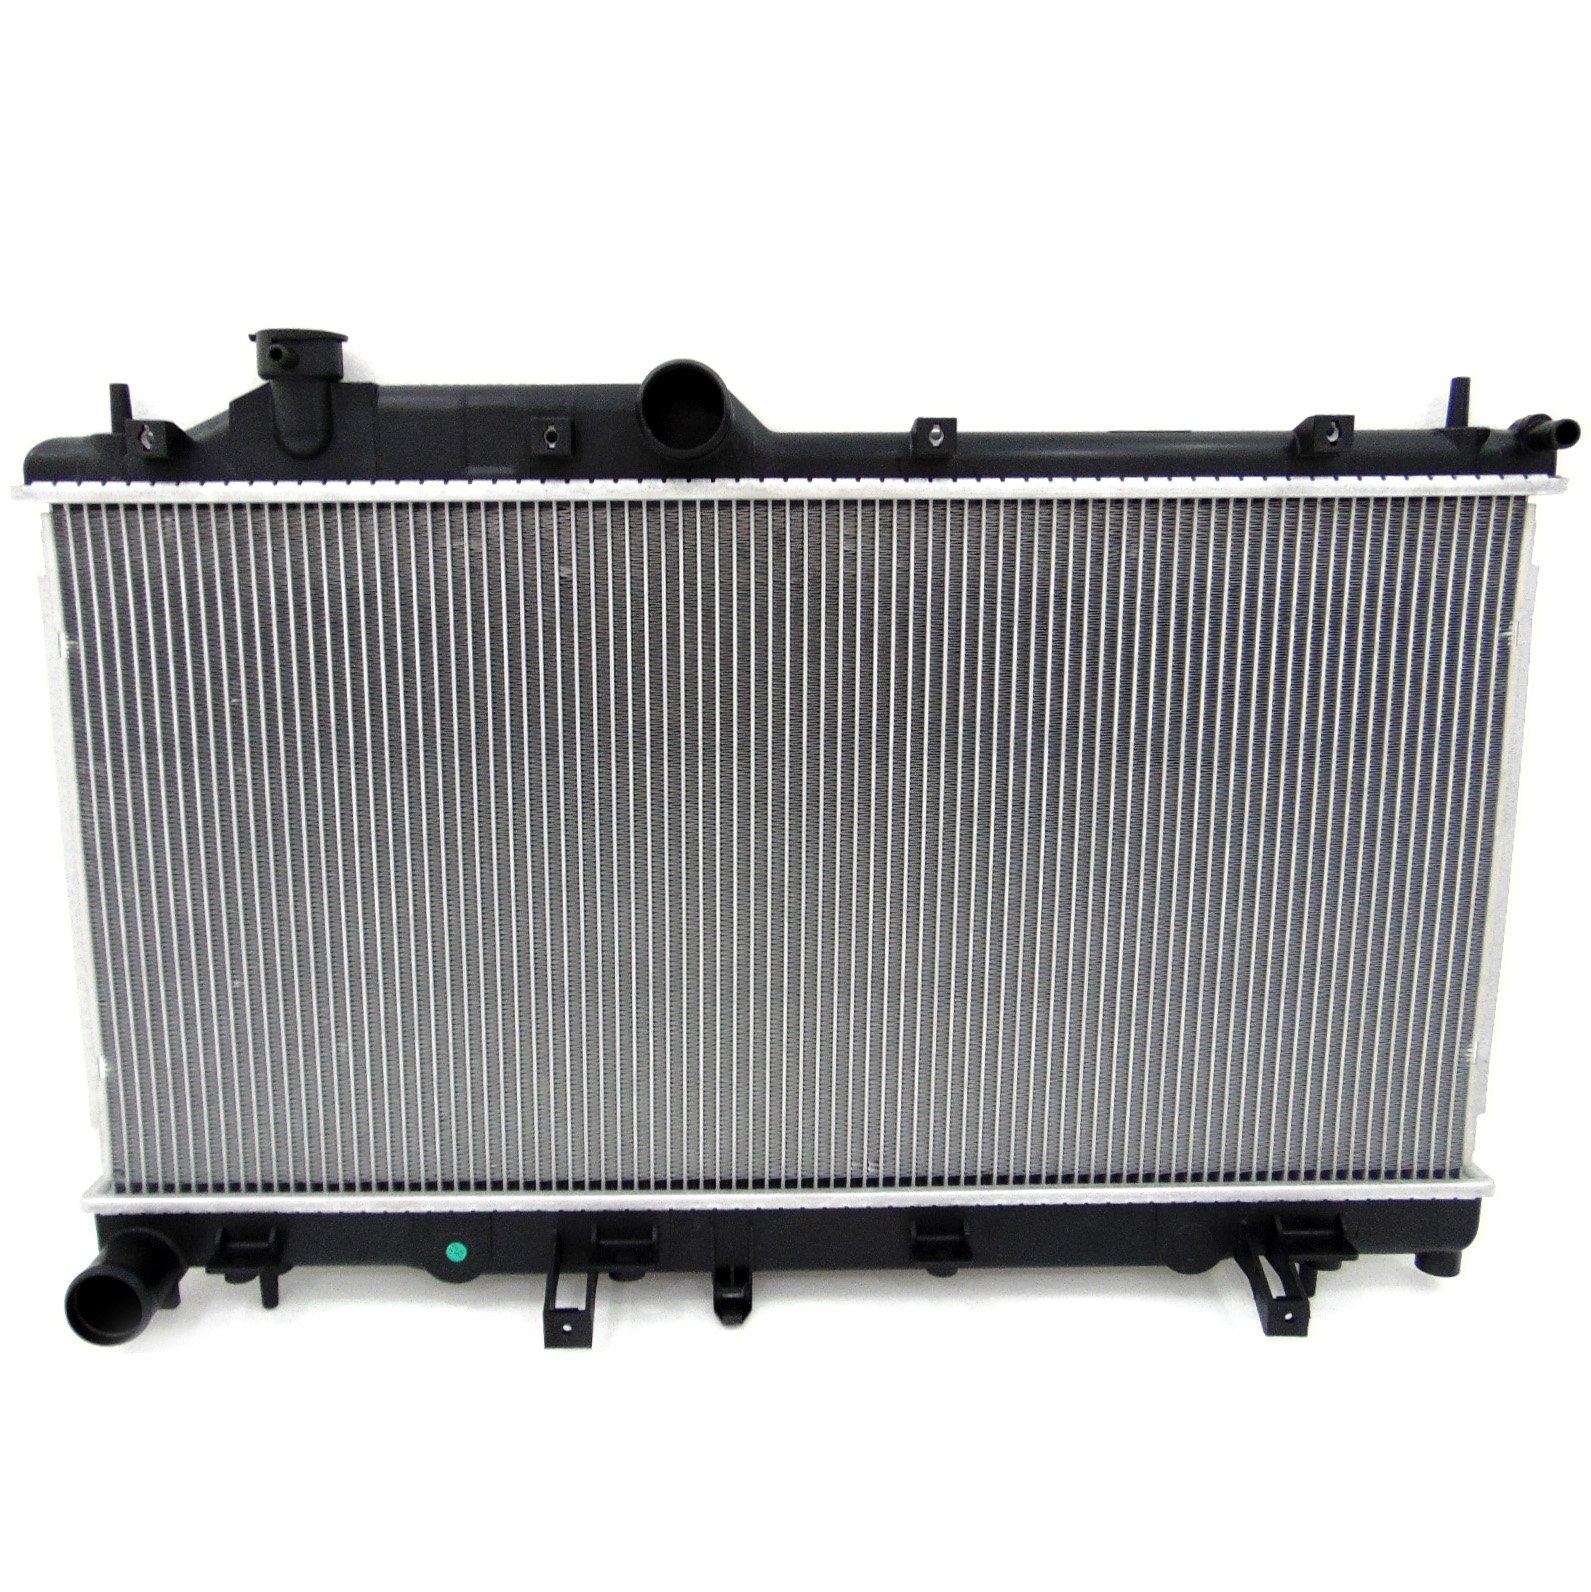 ECCPP Automatic Radiator 13091 for 2008-2014 Subaru Impreza 2.5L by ECCPP